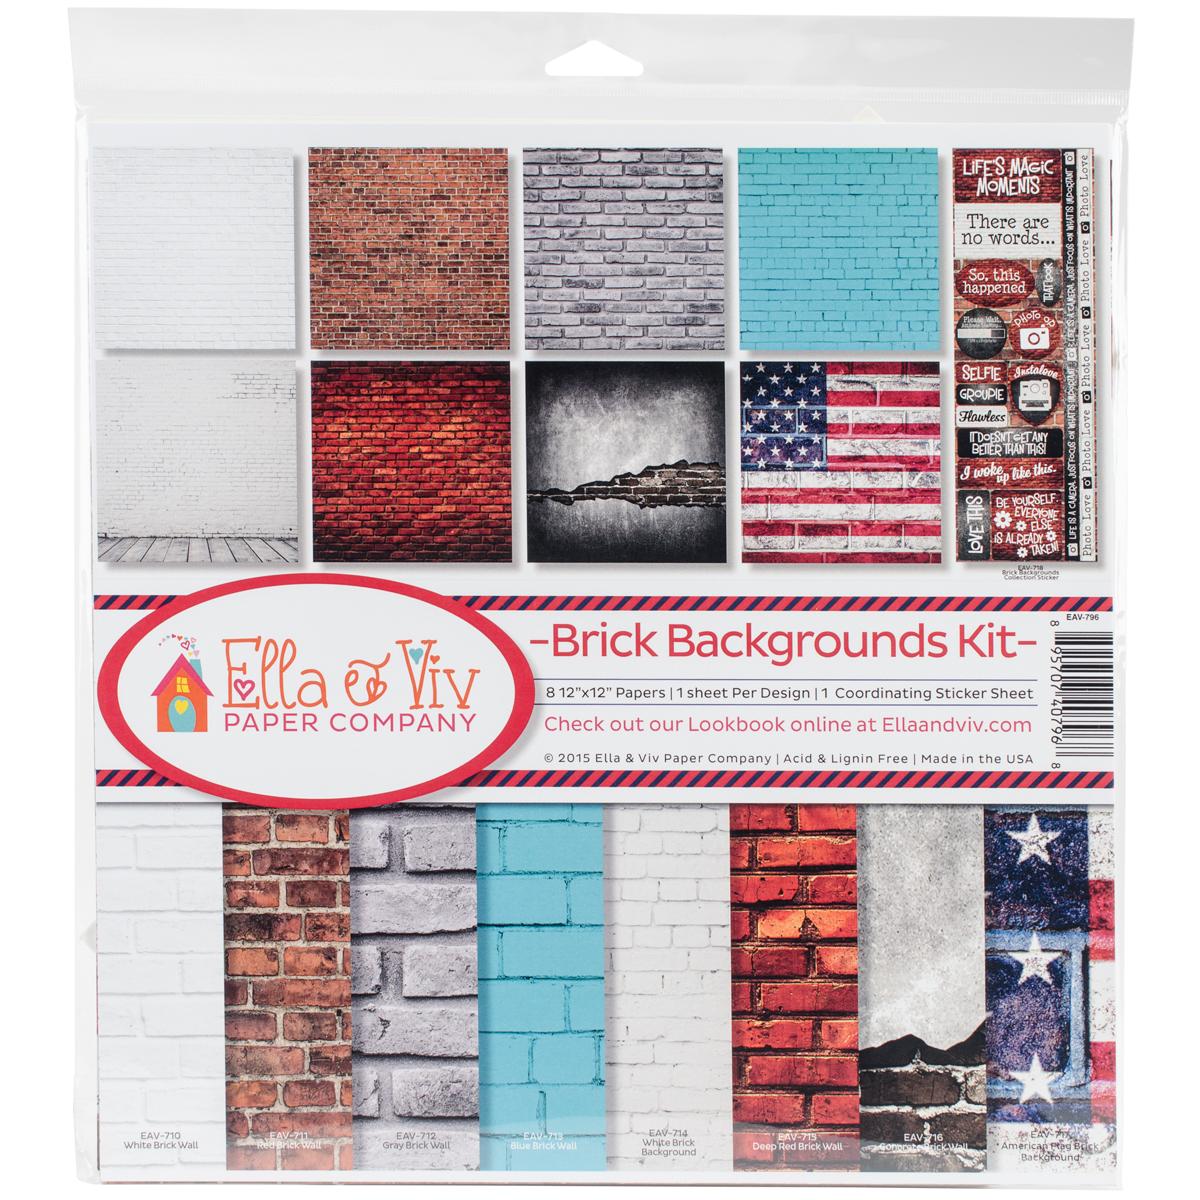 Ella & Viv Collection Kit 12X12-Brick Backgrounds